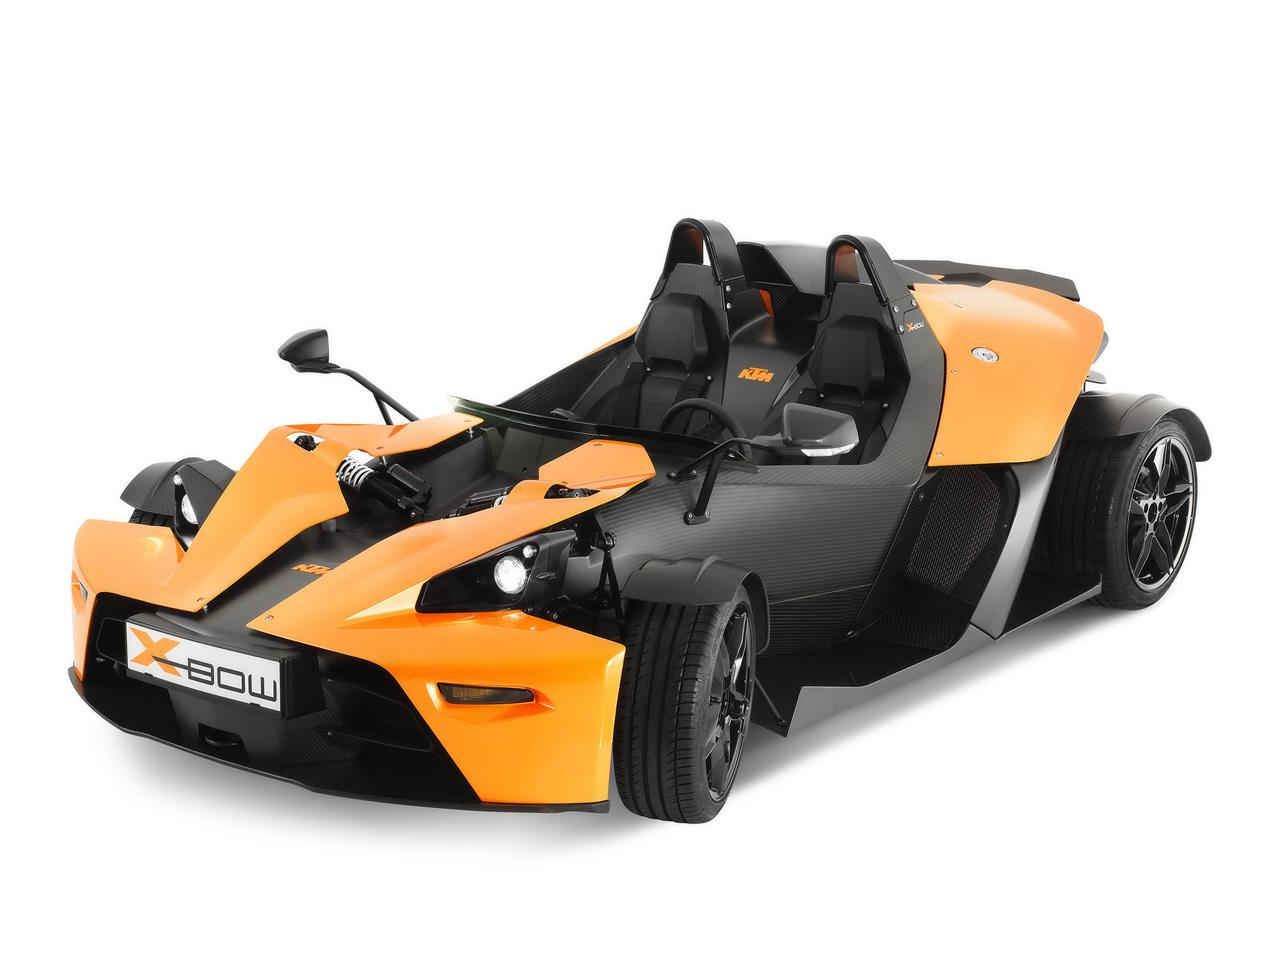 Lexus Dealership Phoenix >> KTM Offers 134 mph Street Legal Go-Kart Racer